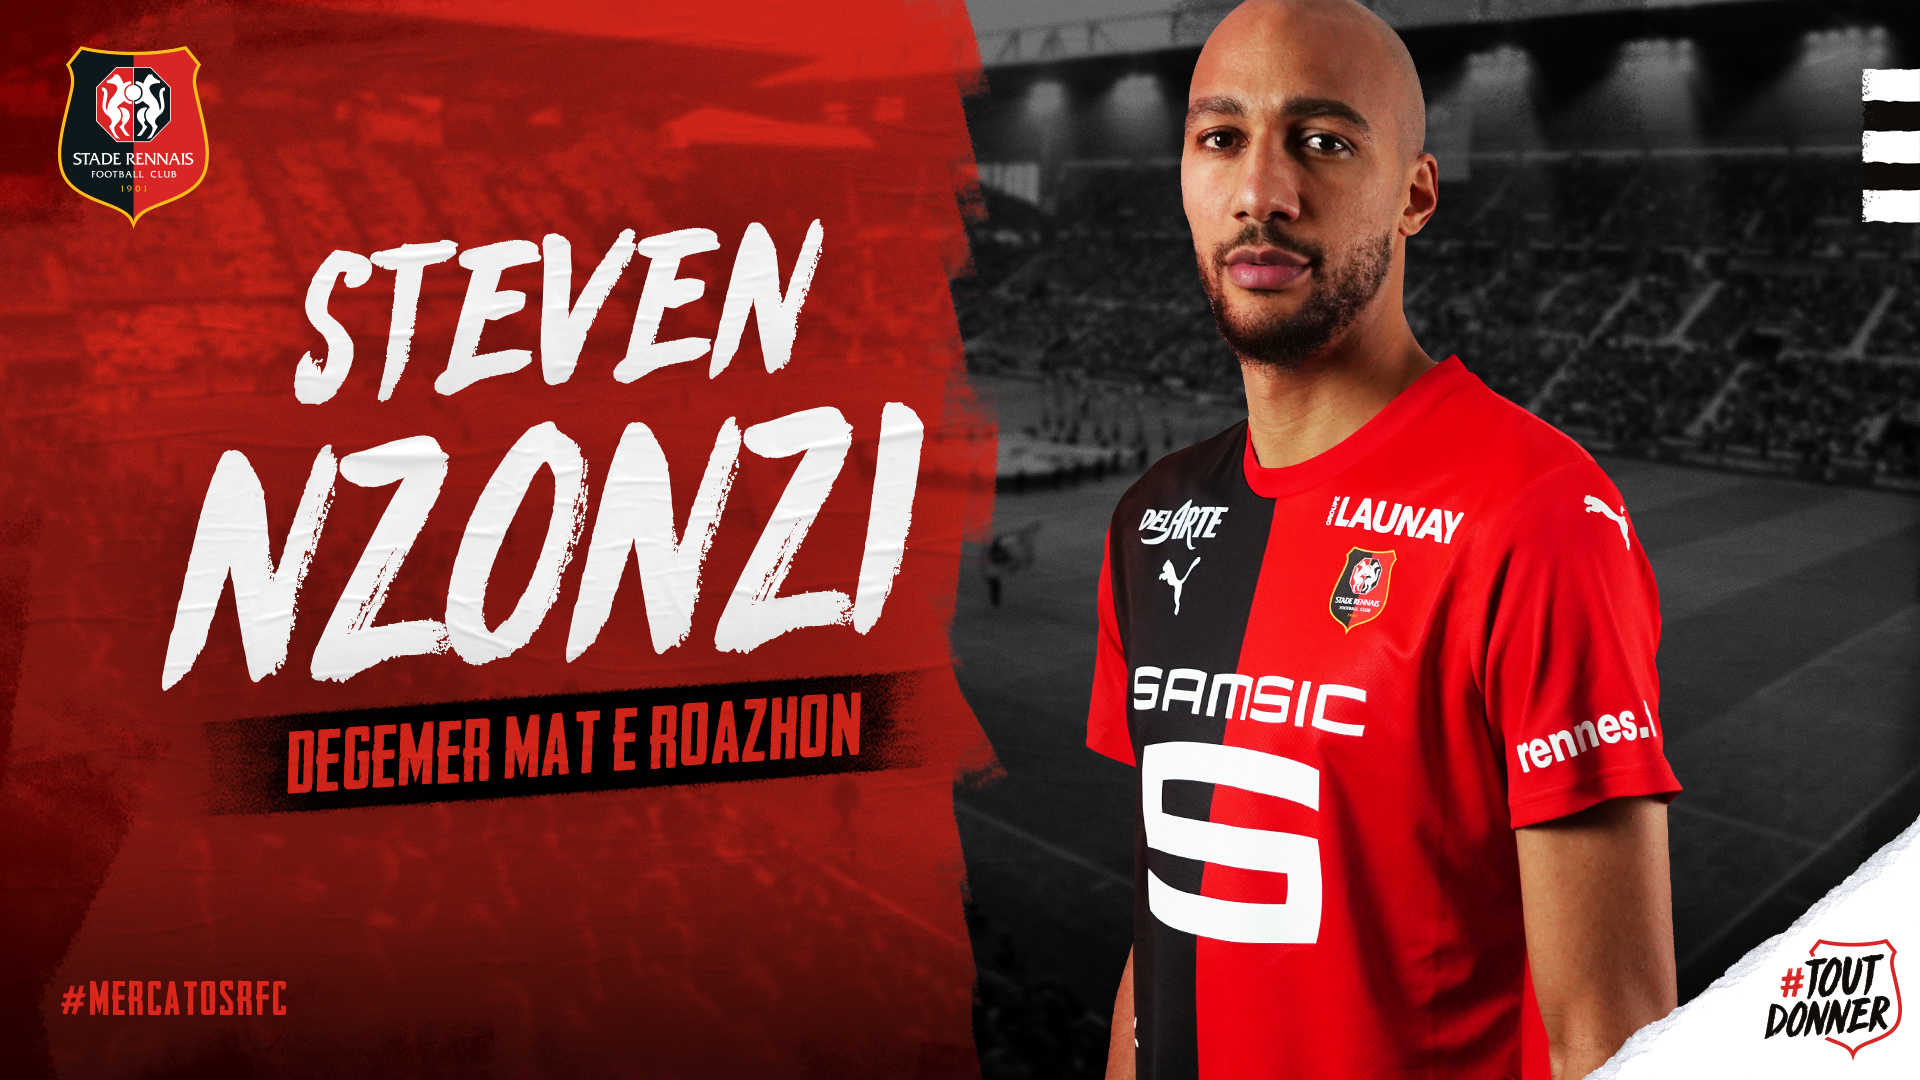 STEVEN NZONZI # FRANCE STADE RENNAIS UPDATE TRANSFERT STICKER PANINI FOOT 2020